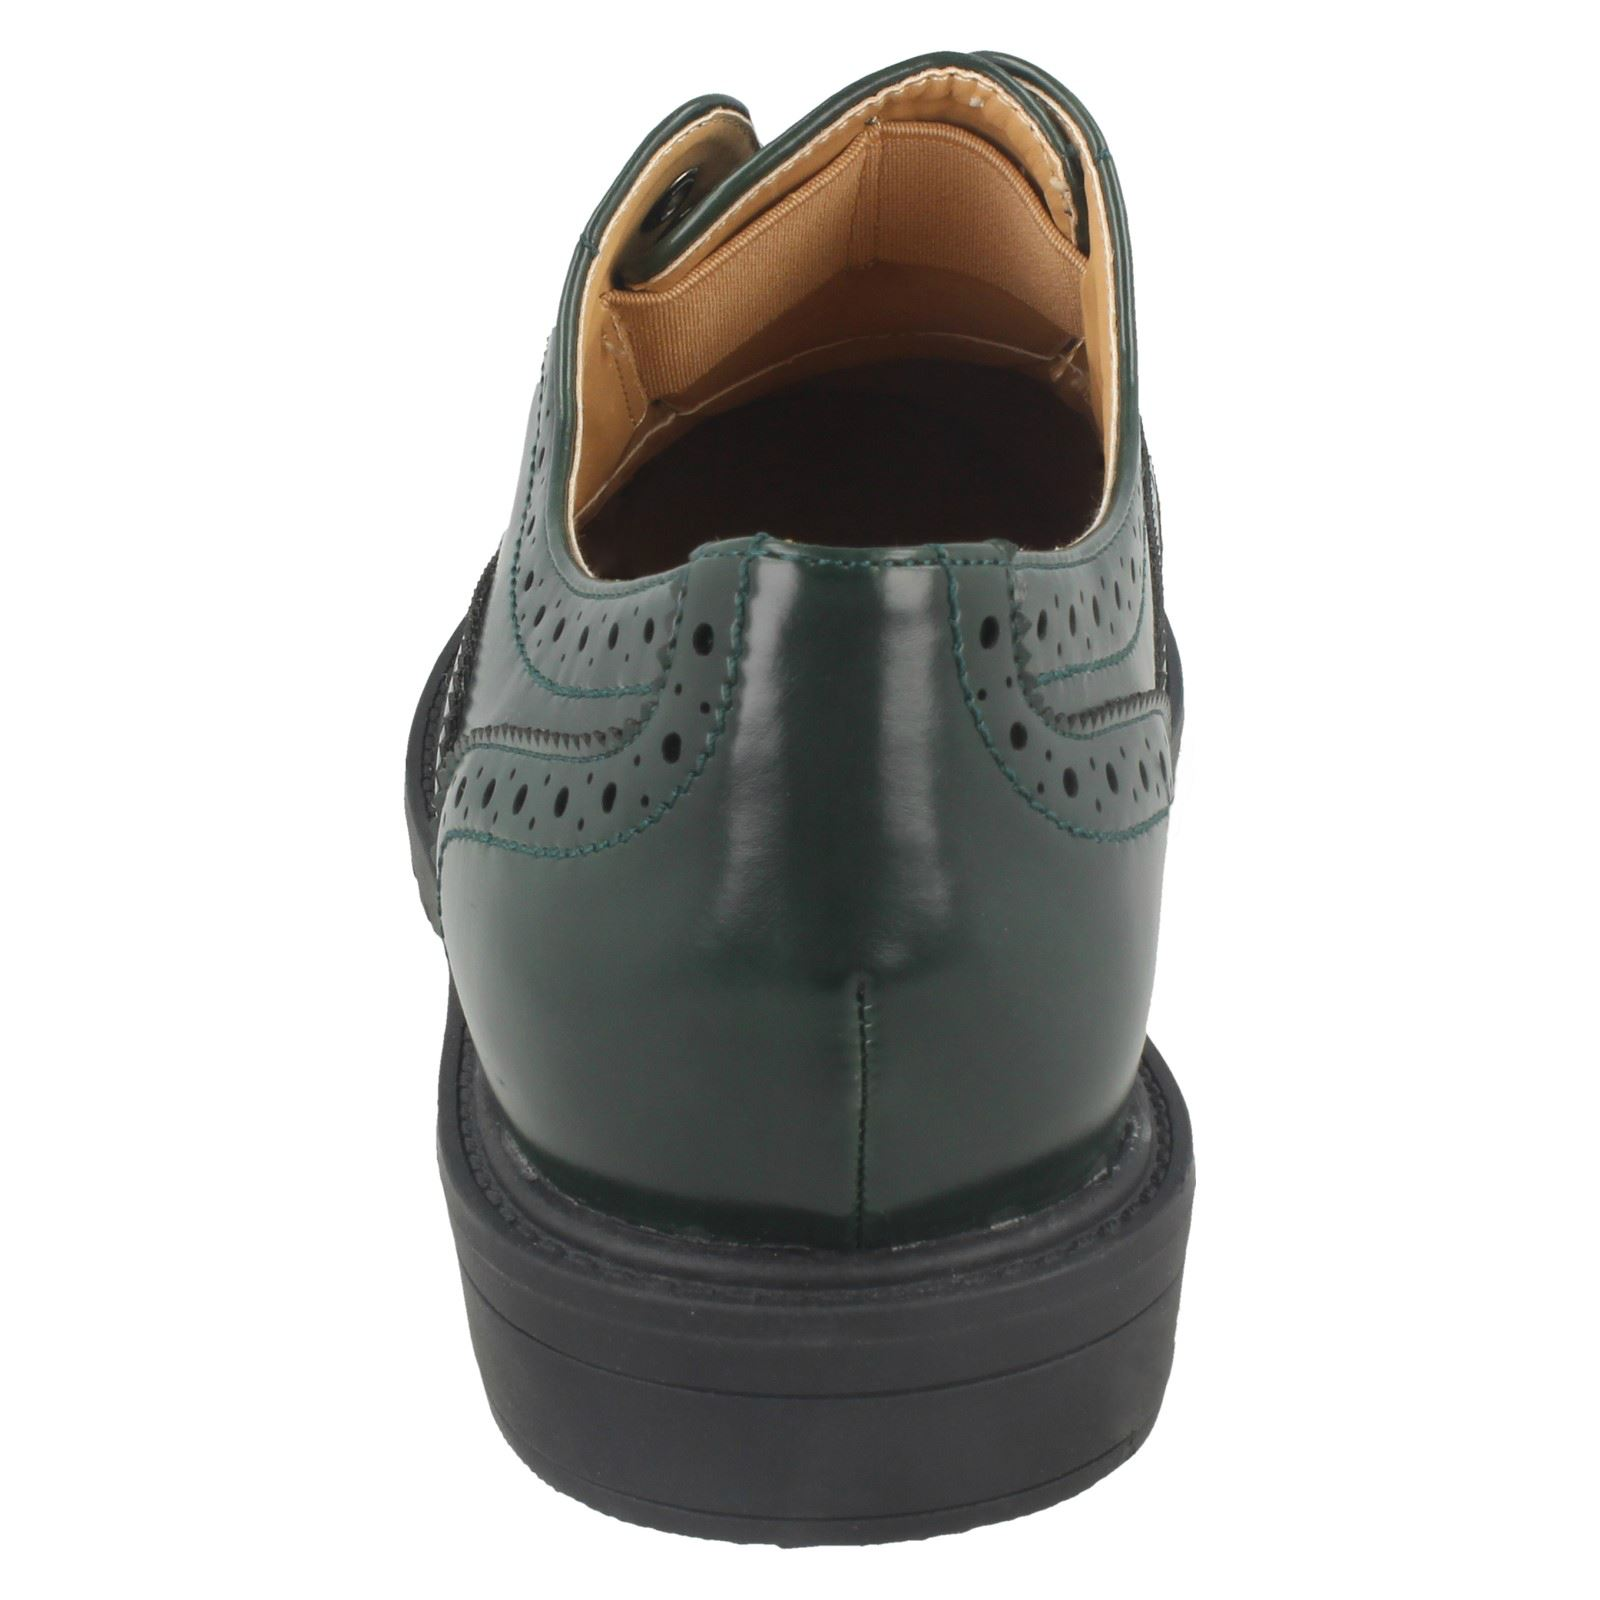 Spot On Ladies Brogue Patterned Shoe